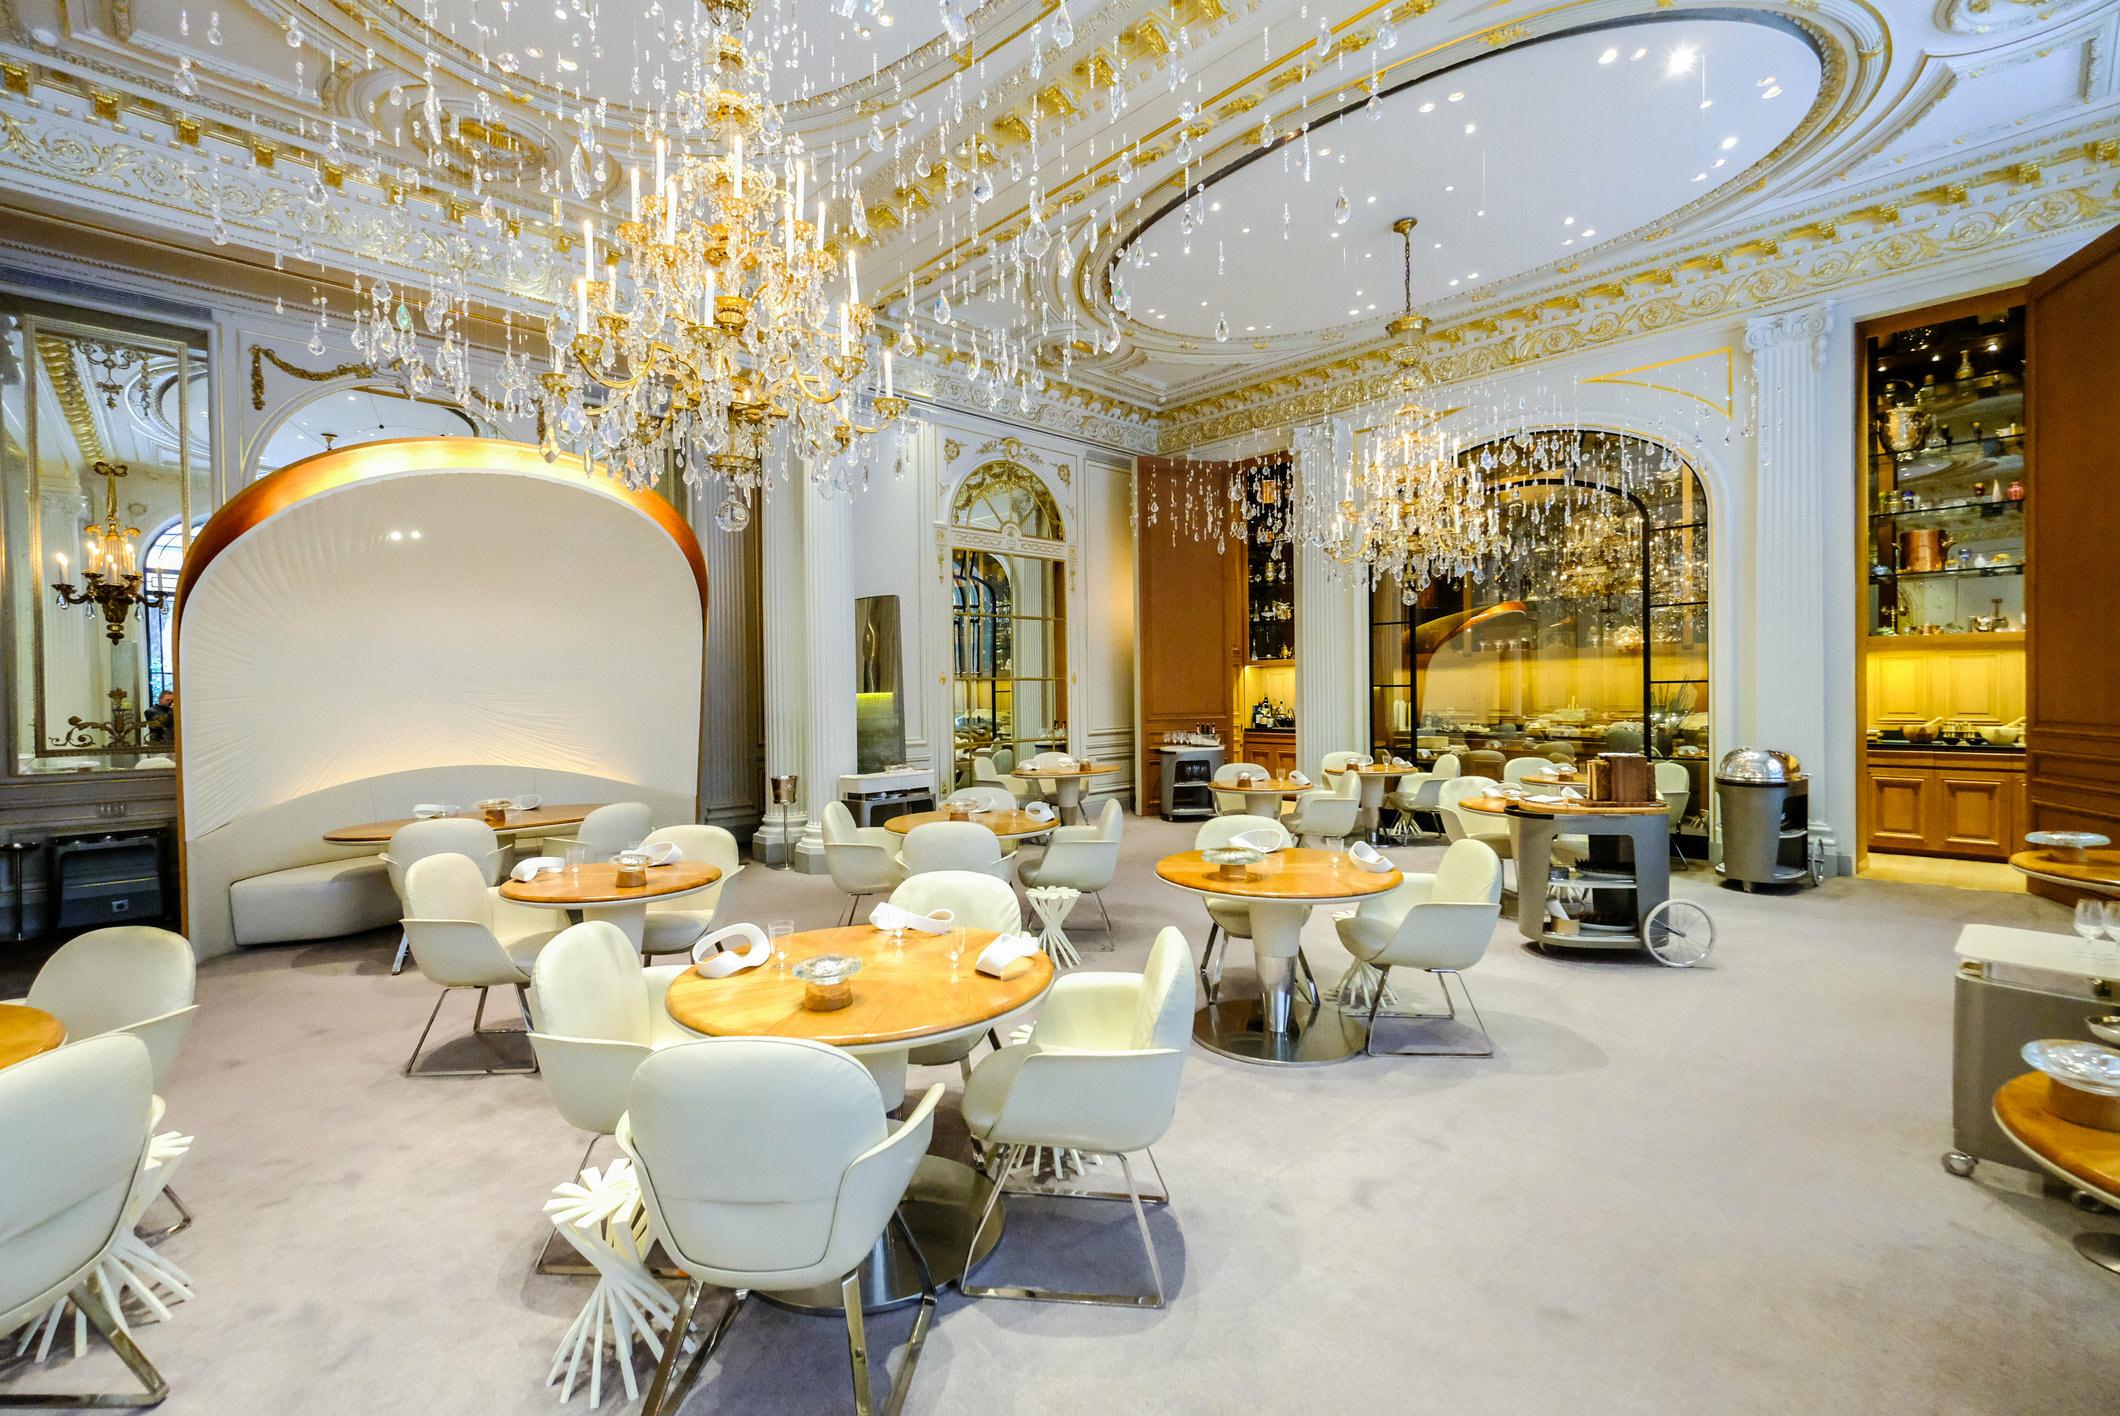 Alain Ducasse Au Plaza Athenee Restaurant Review Wbp Stars